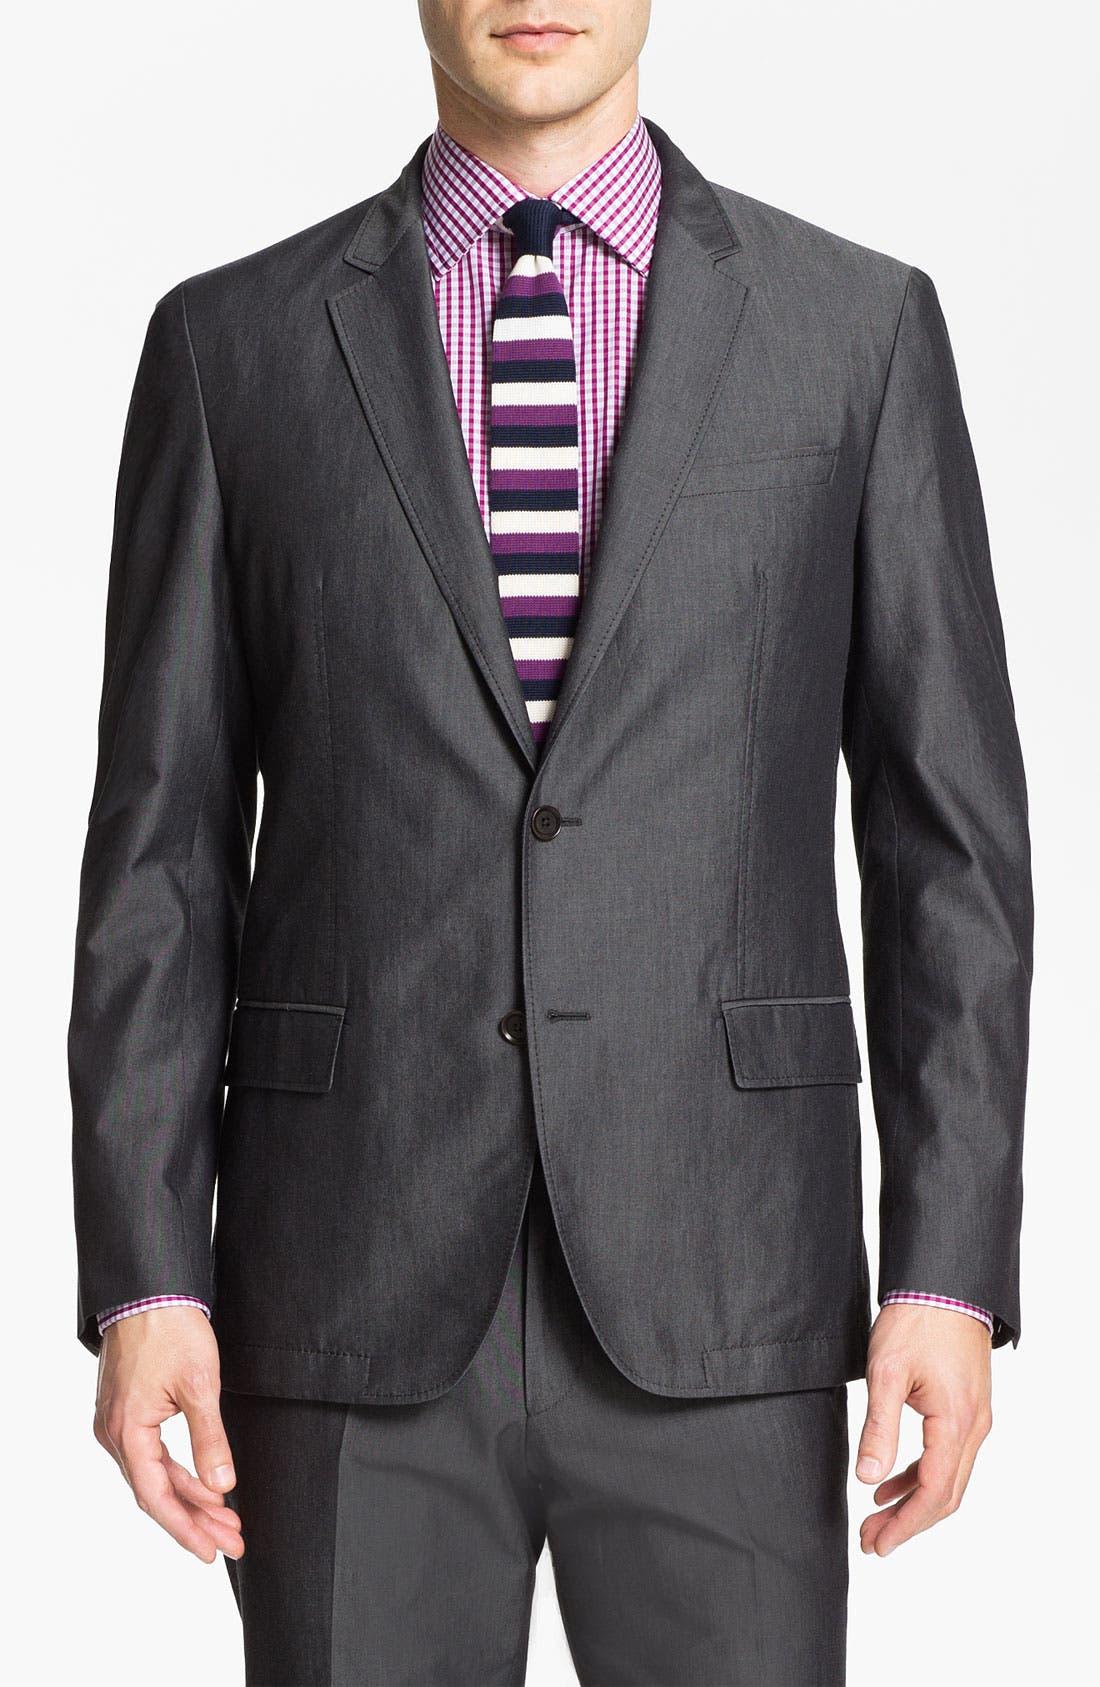 Alternate Image 1 Selected - BOSS HUGO BOSS 'Heaven/Fly' Trim Fit Cotton Blend Suit